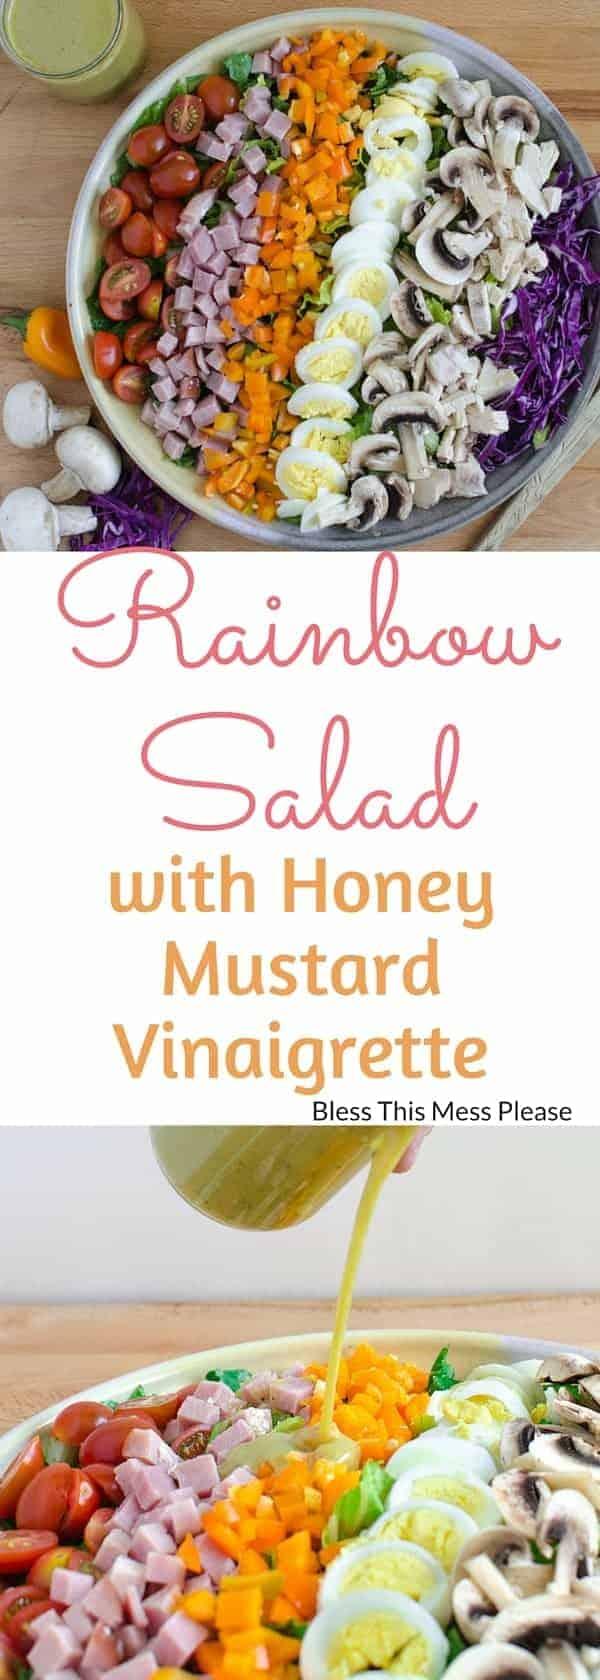 Rainbow Salad with Honey Mustard Vinaigrette